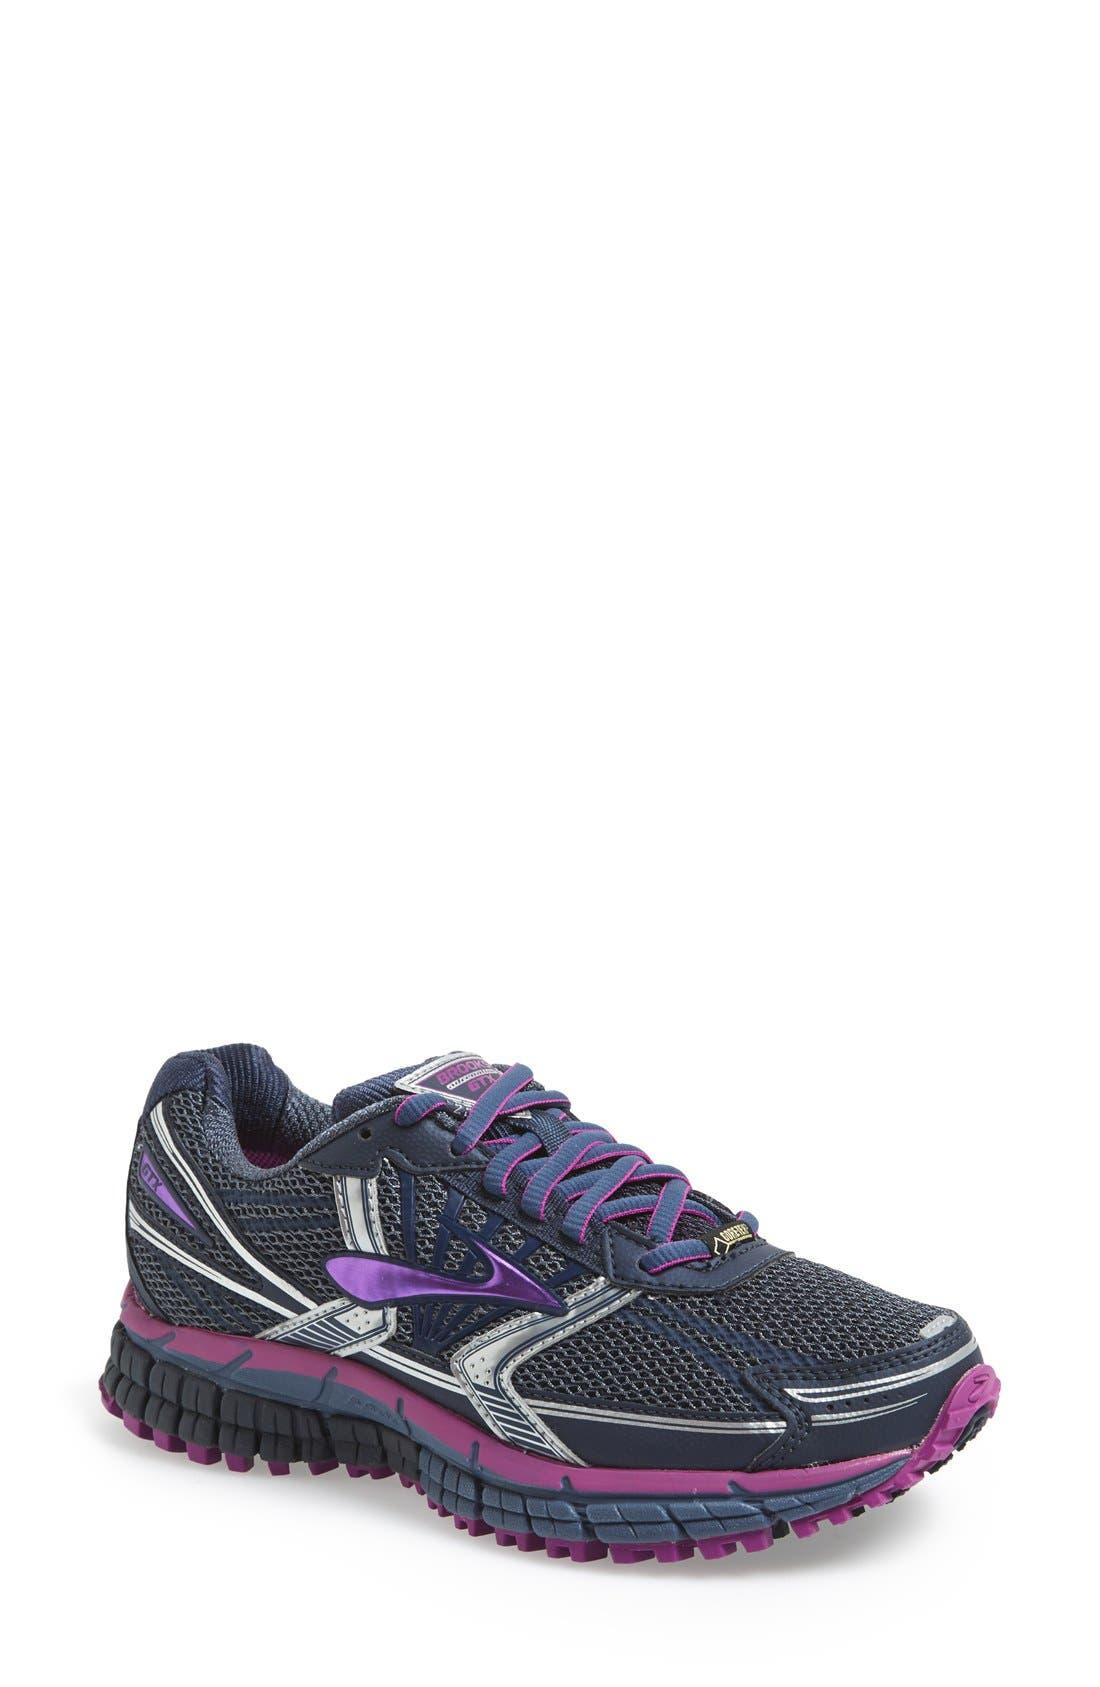 'Adrenaline ASR 11 GTX' Waterproof Running Shoe,                             Main thumbnail 1, color,                             021